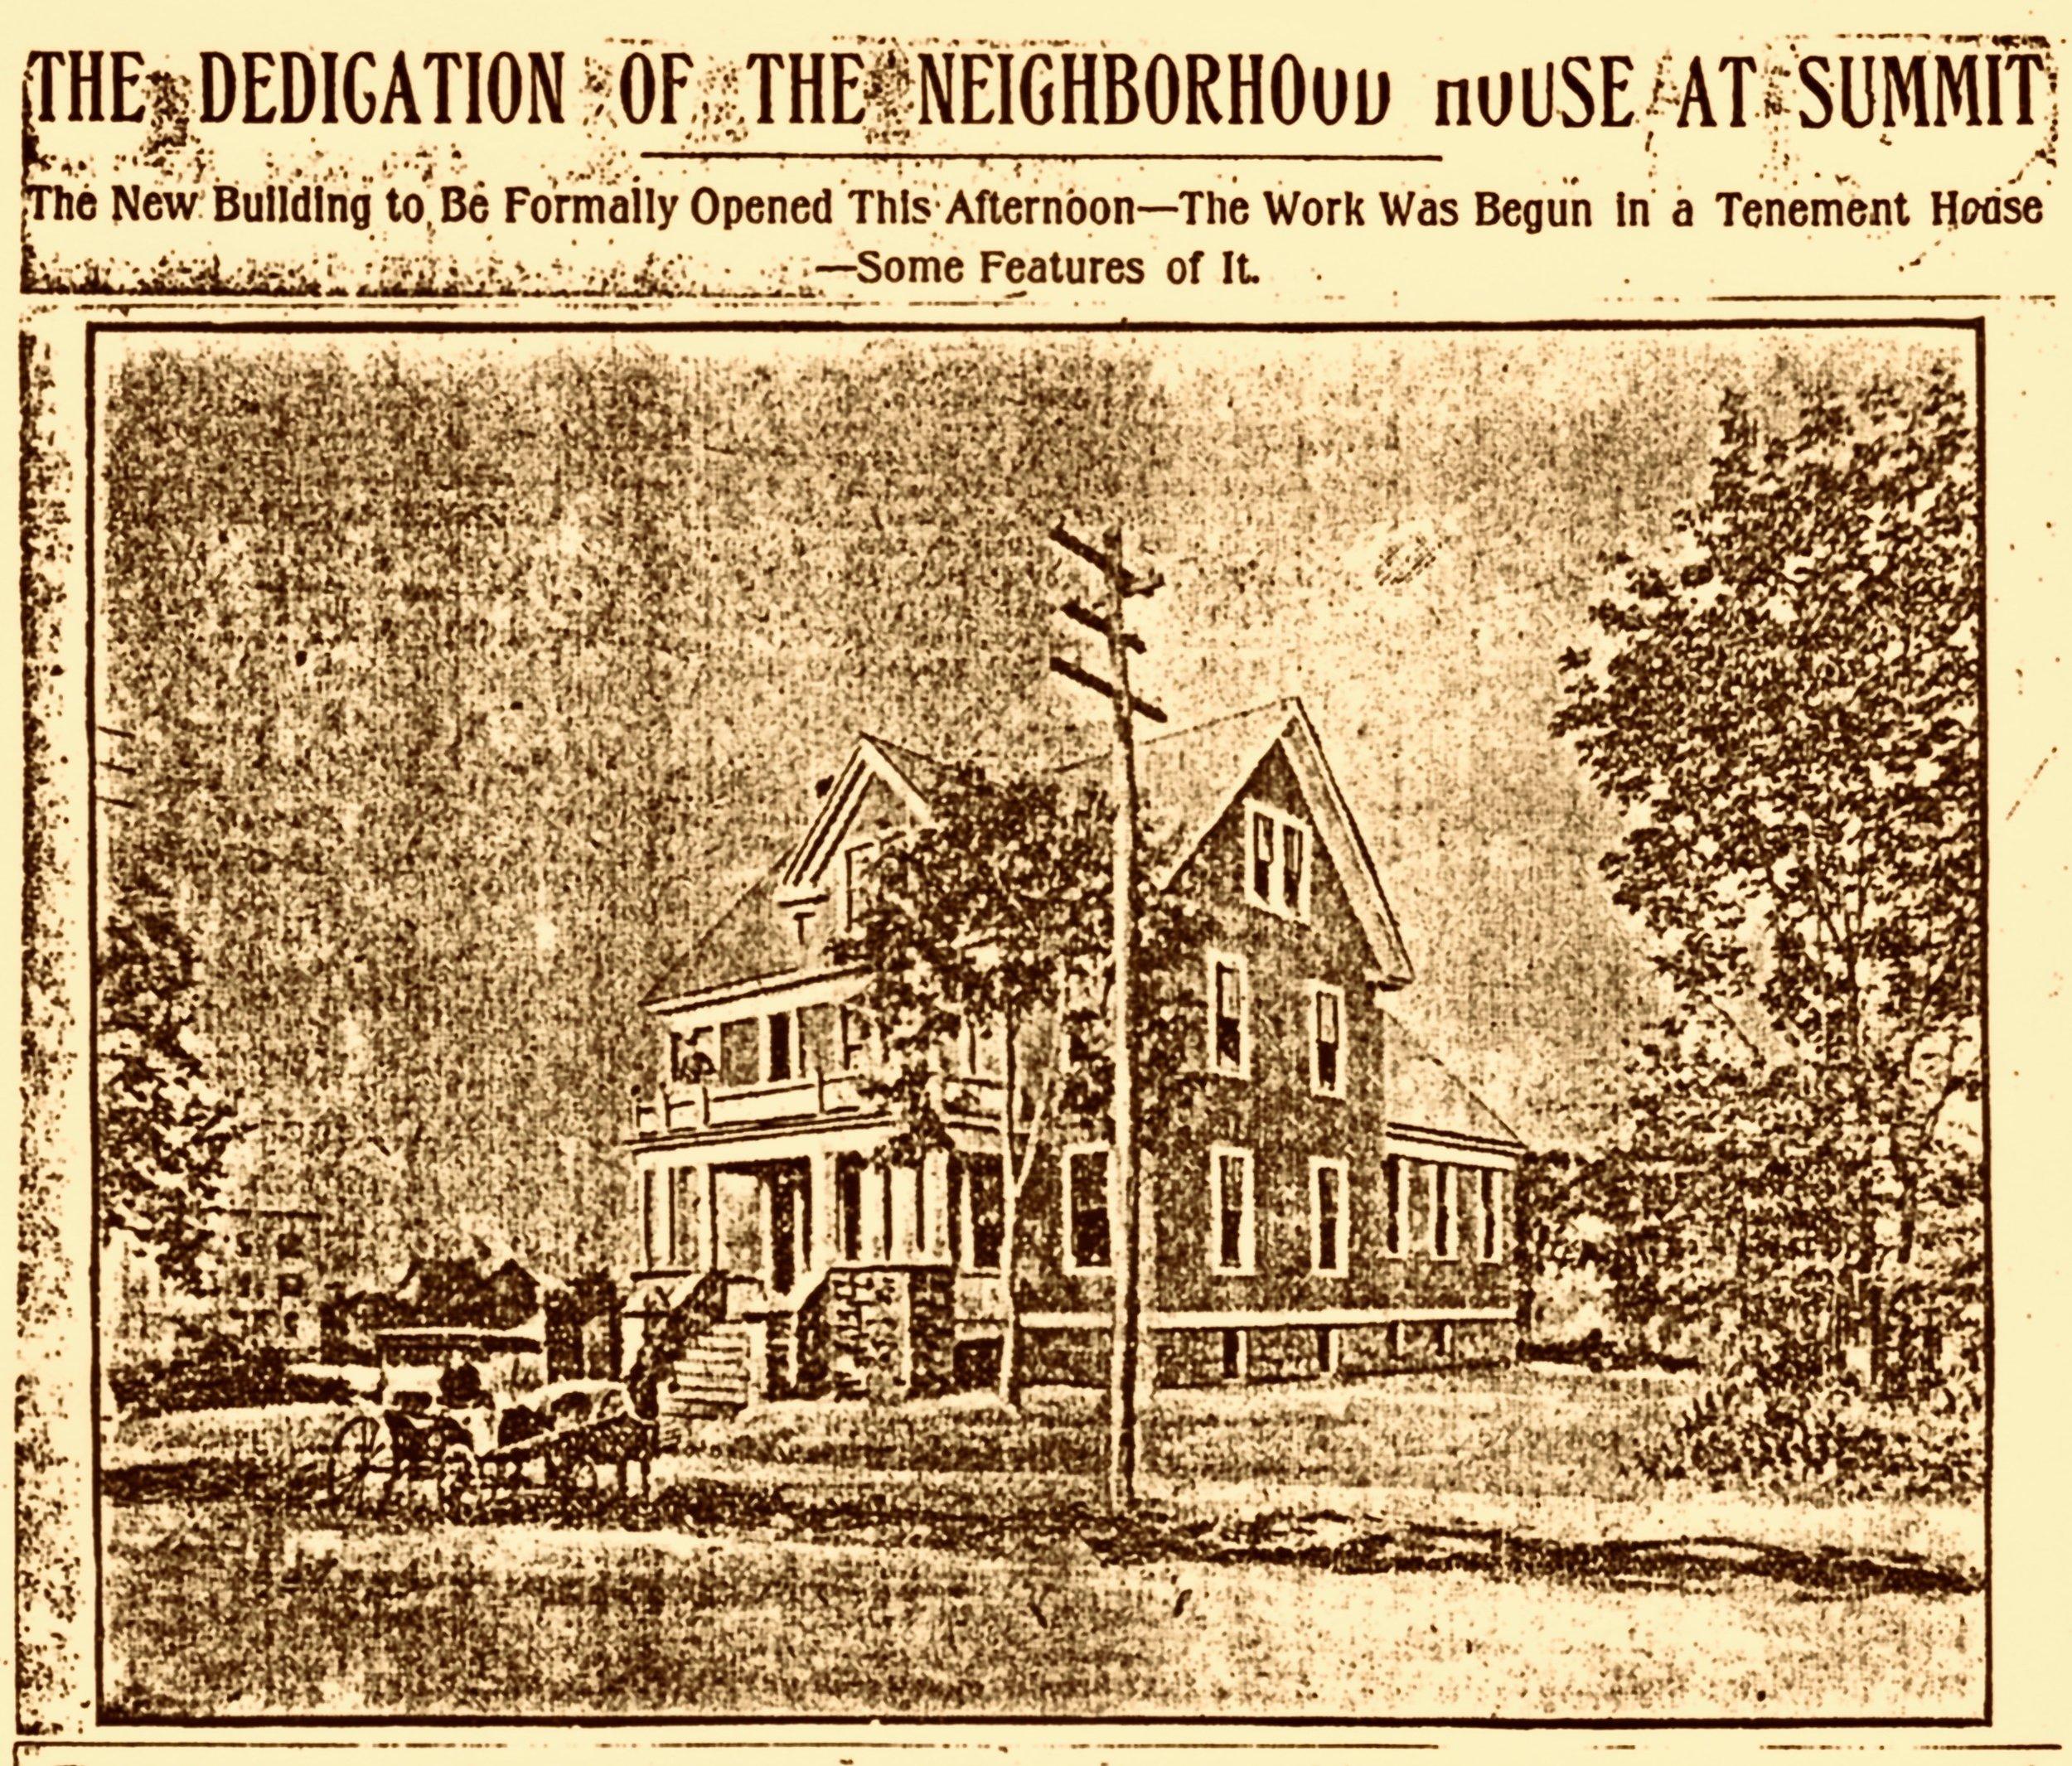 1904 · Opening of The Neighborhood House -  The Summit Herald